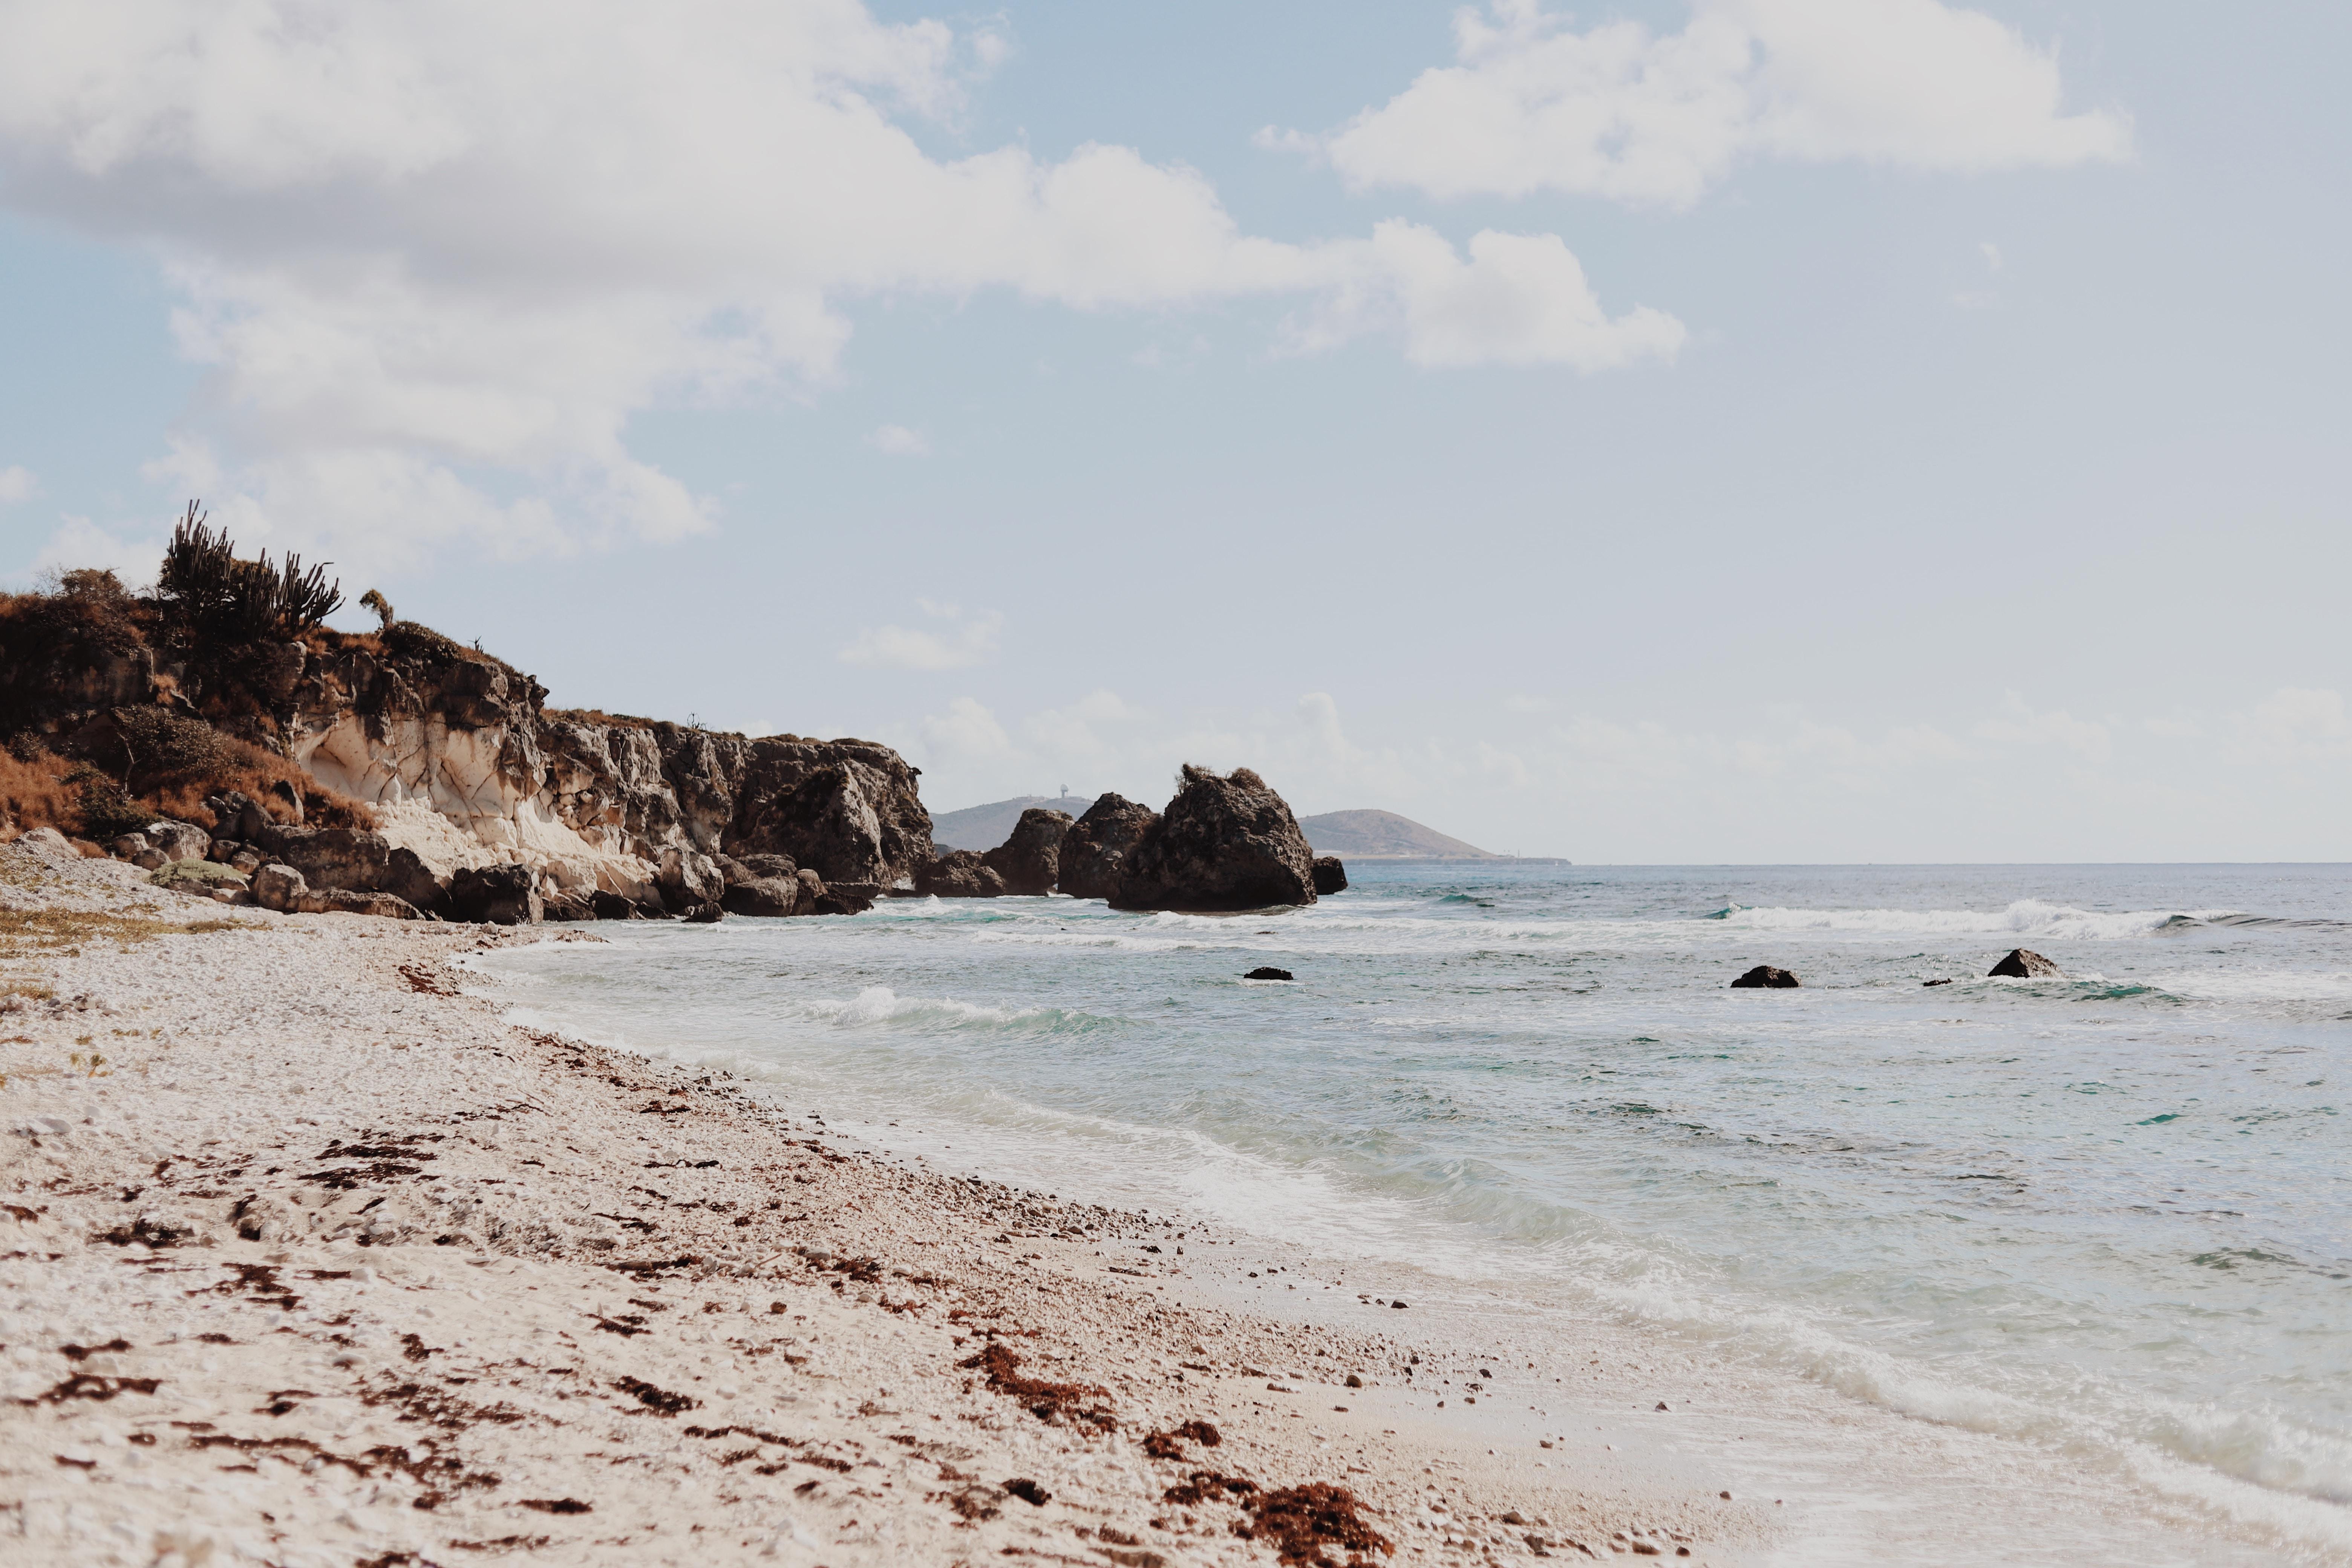 rock formation near shoreline